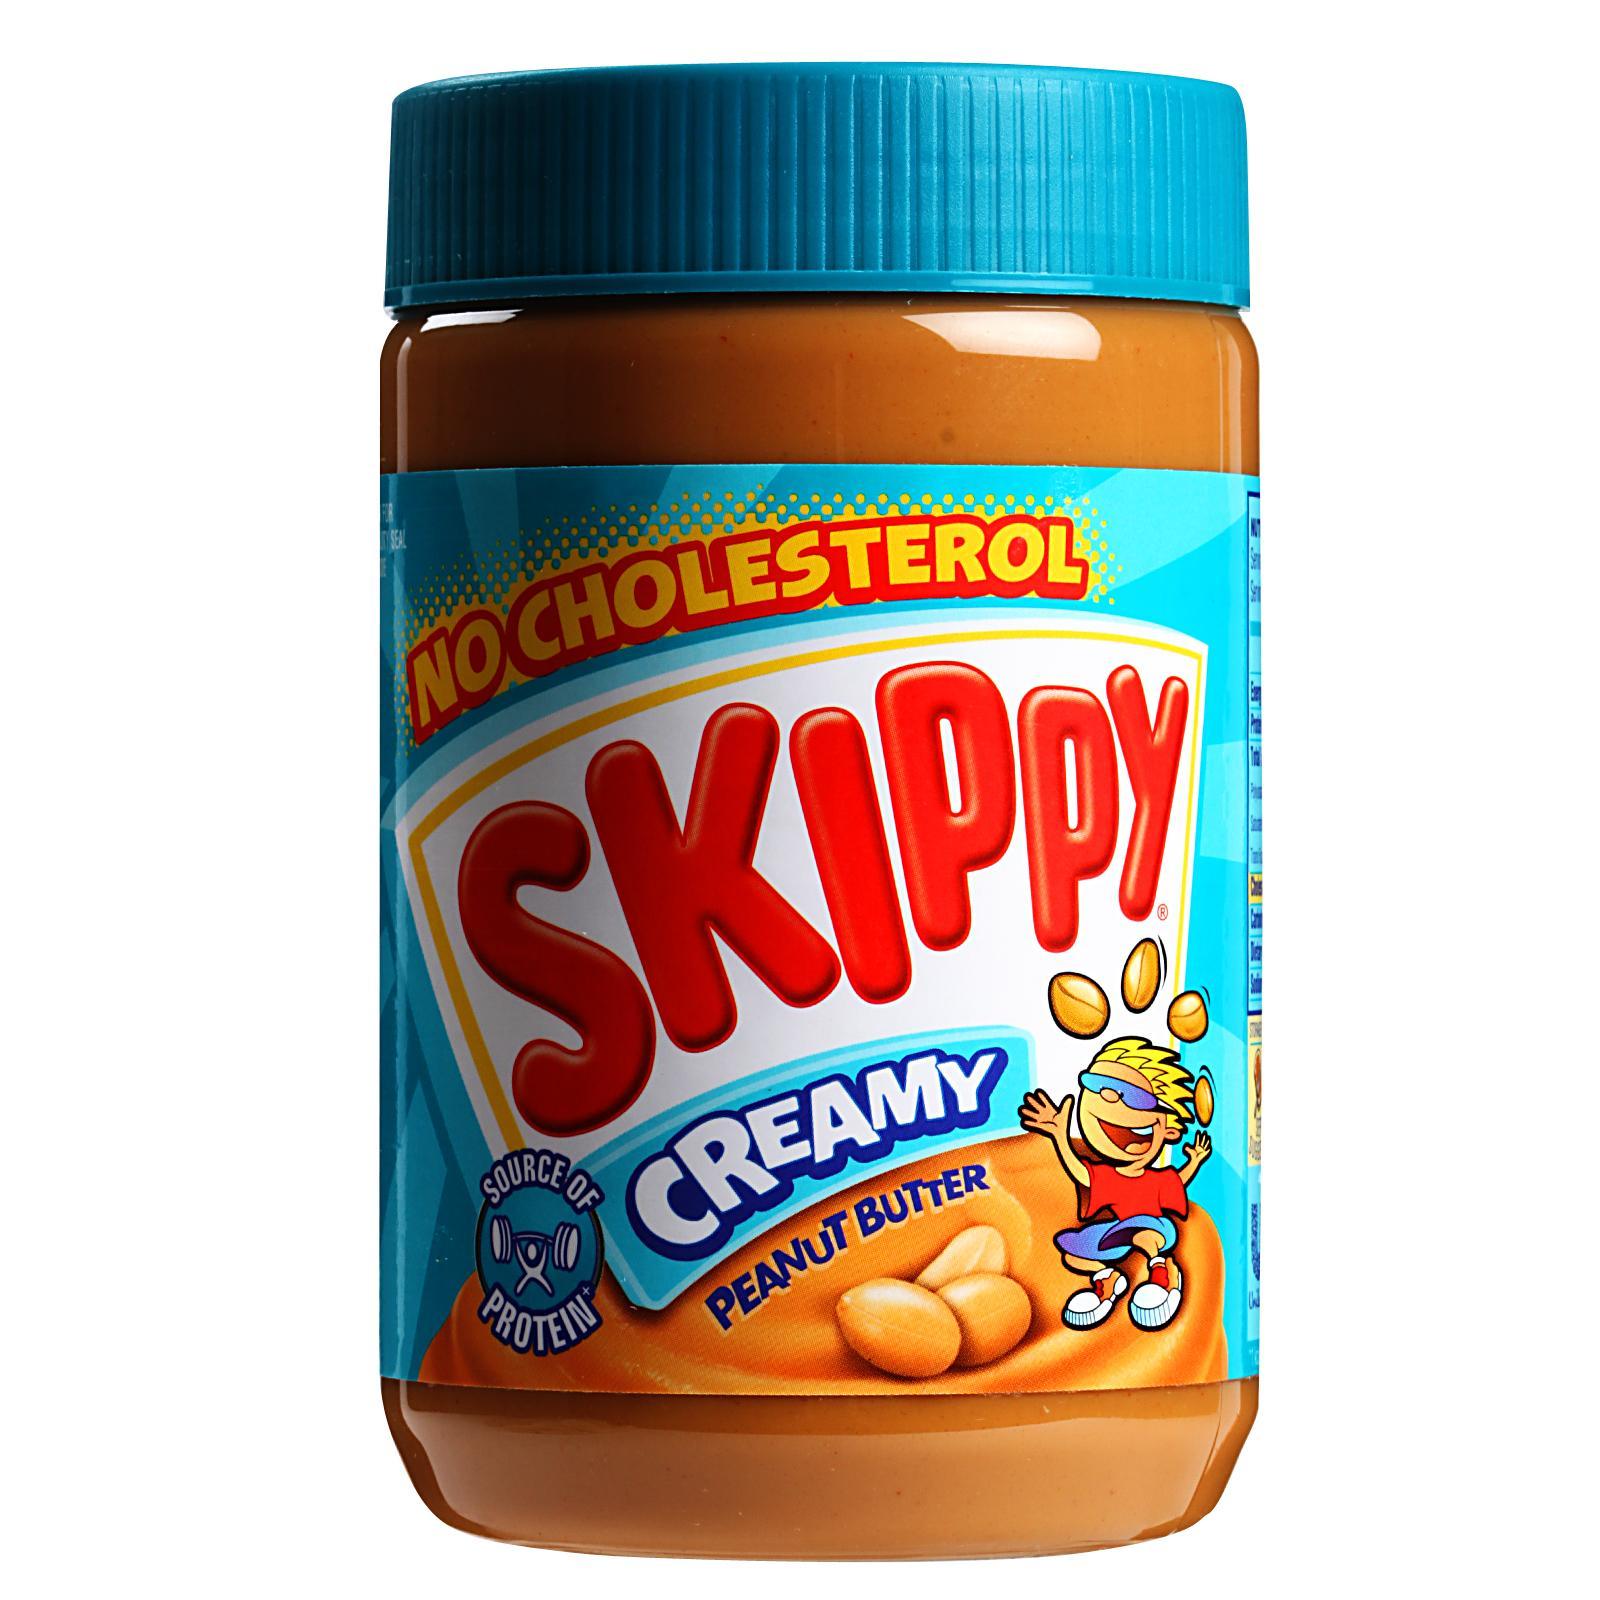 Skippy Creamy Peanut Butter Spread